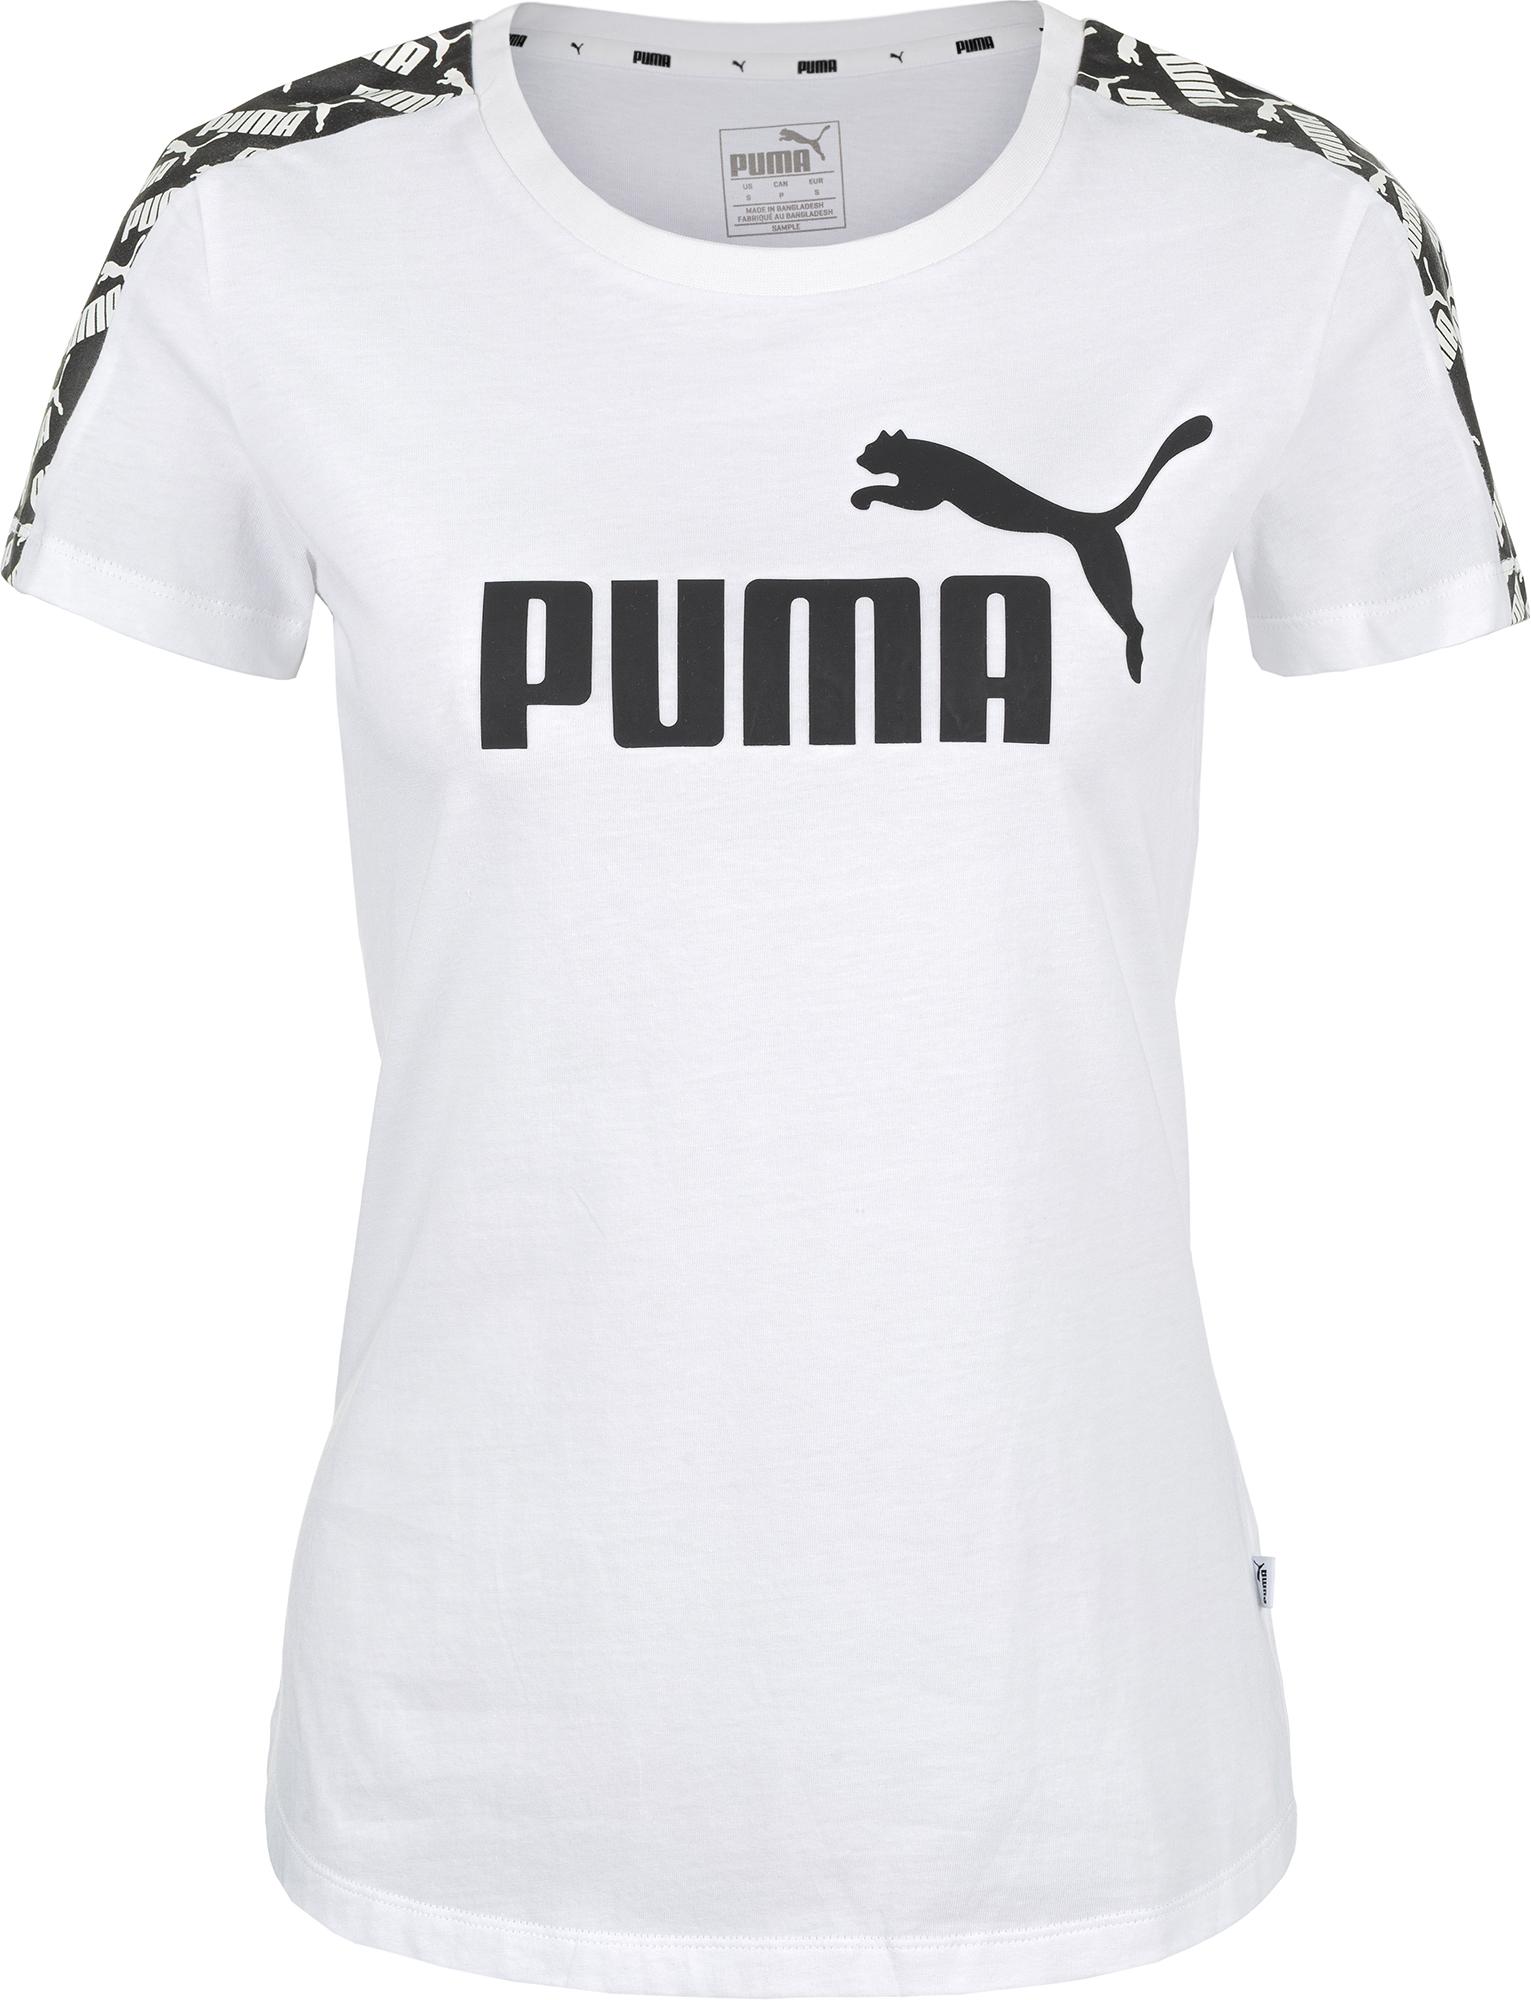 Puma Футболка женская Puma Amplified Tee, размер 40-42 футболка женская puma ess no 1 tee heather w цвет синий 83839920 размер s 42 44